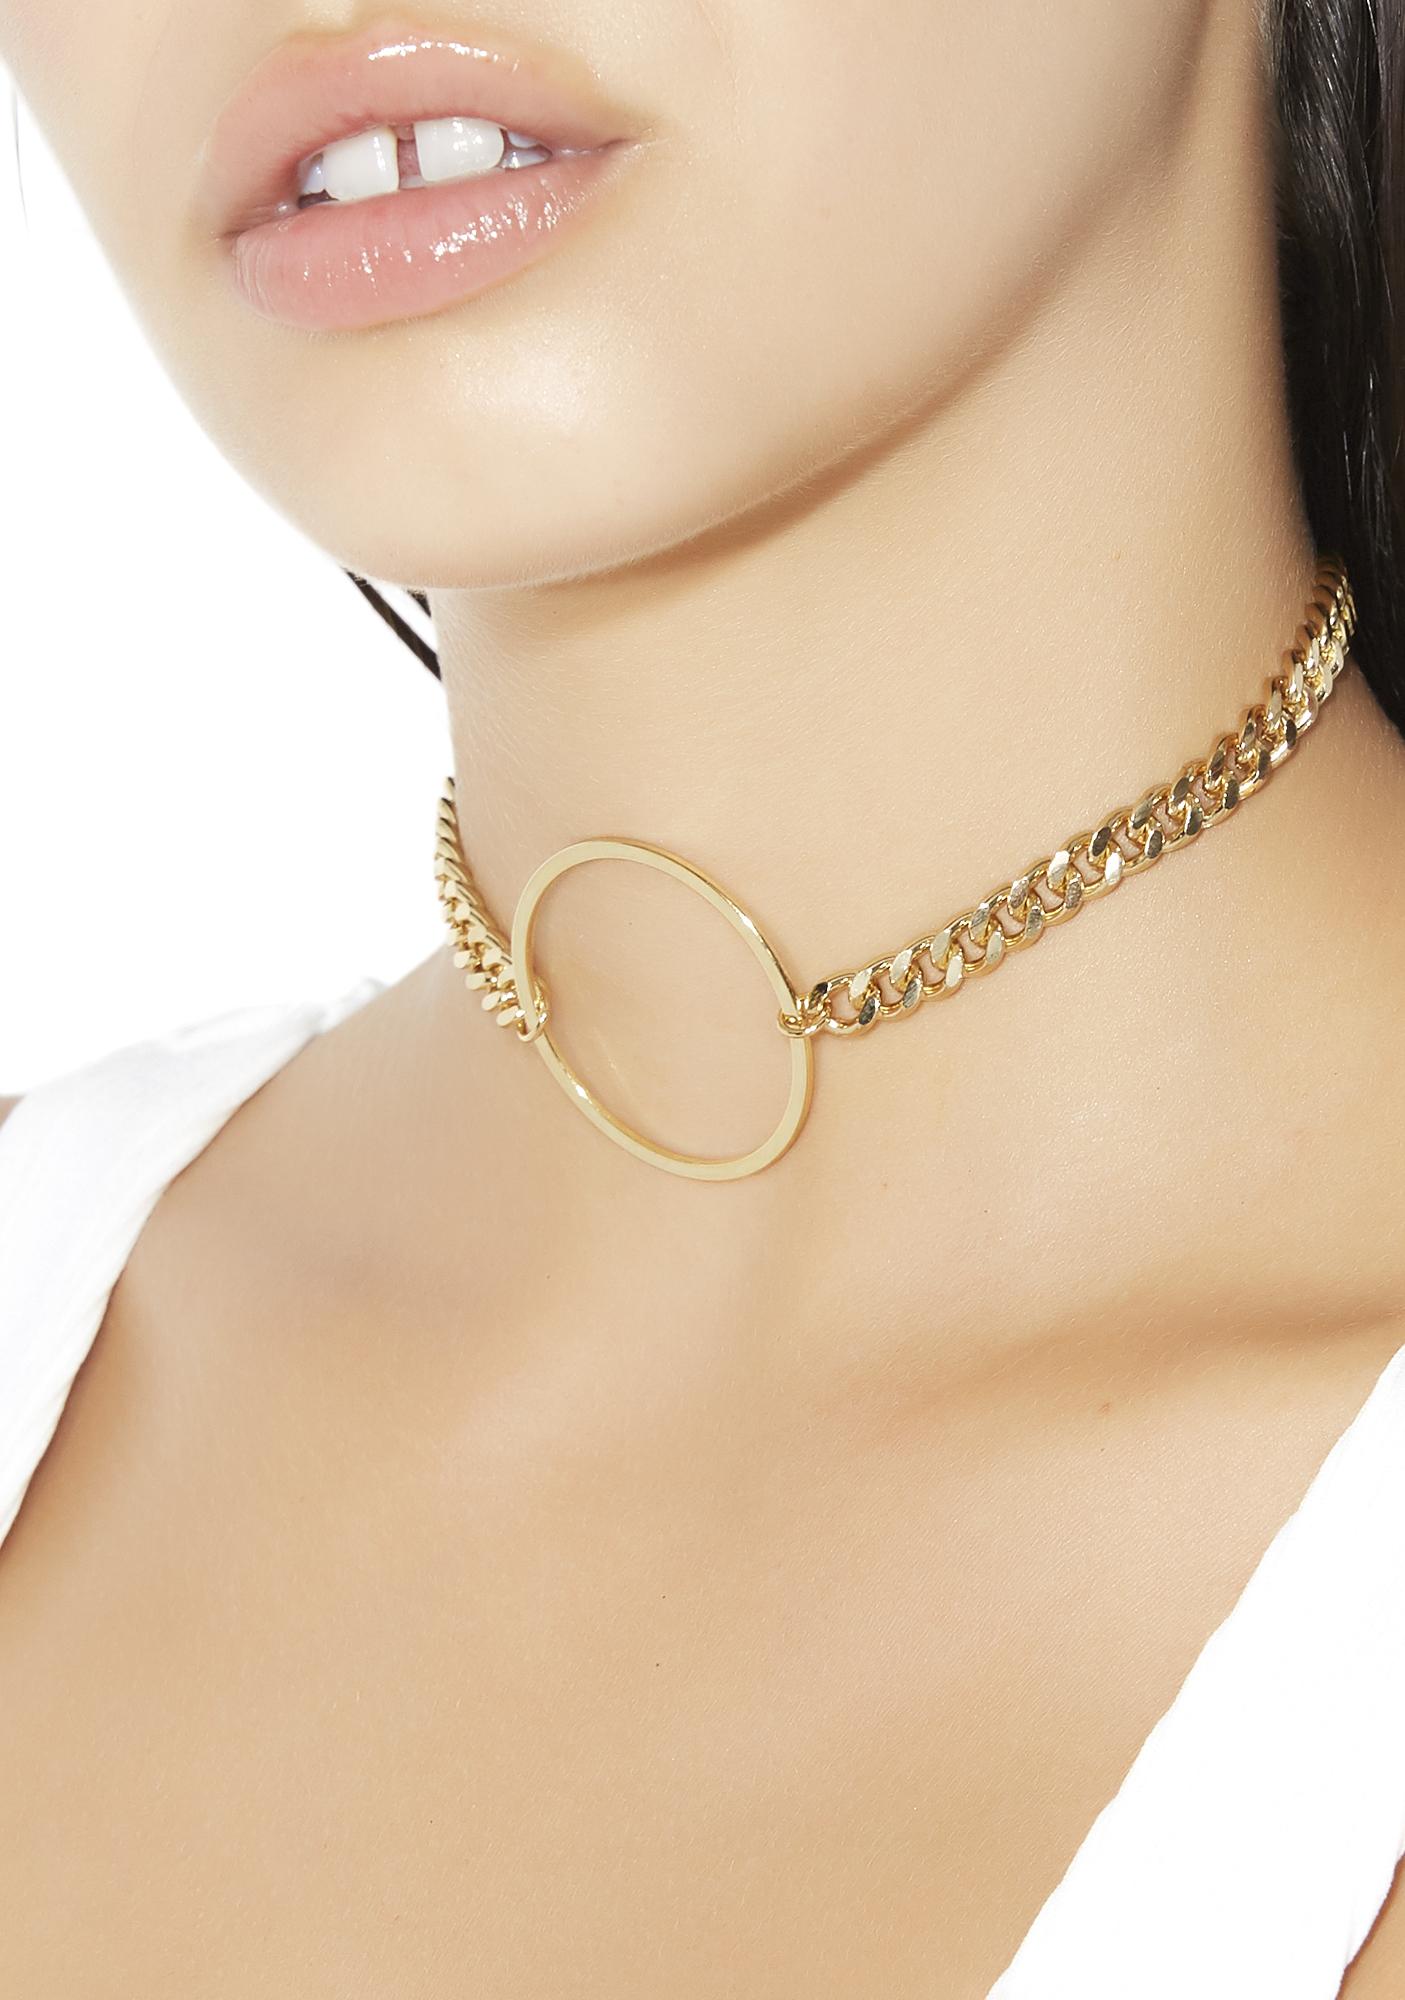 O-Ring Chain Skinny Choker Set Black Gold